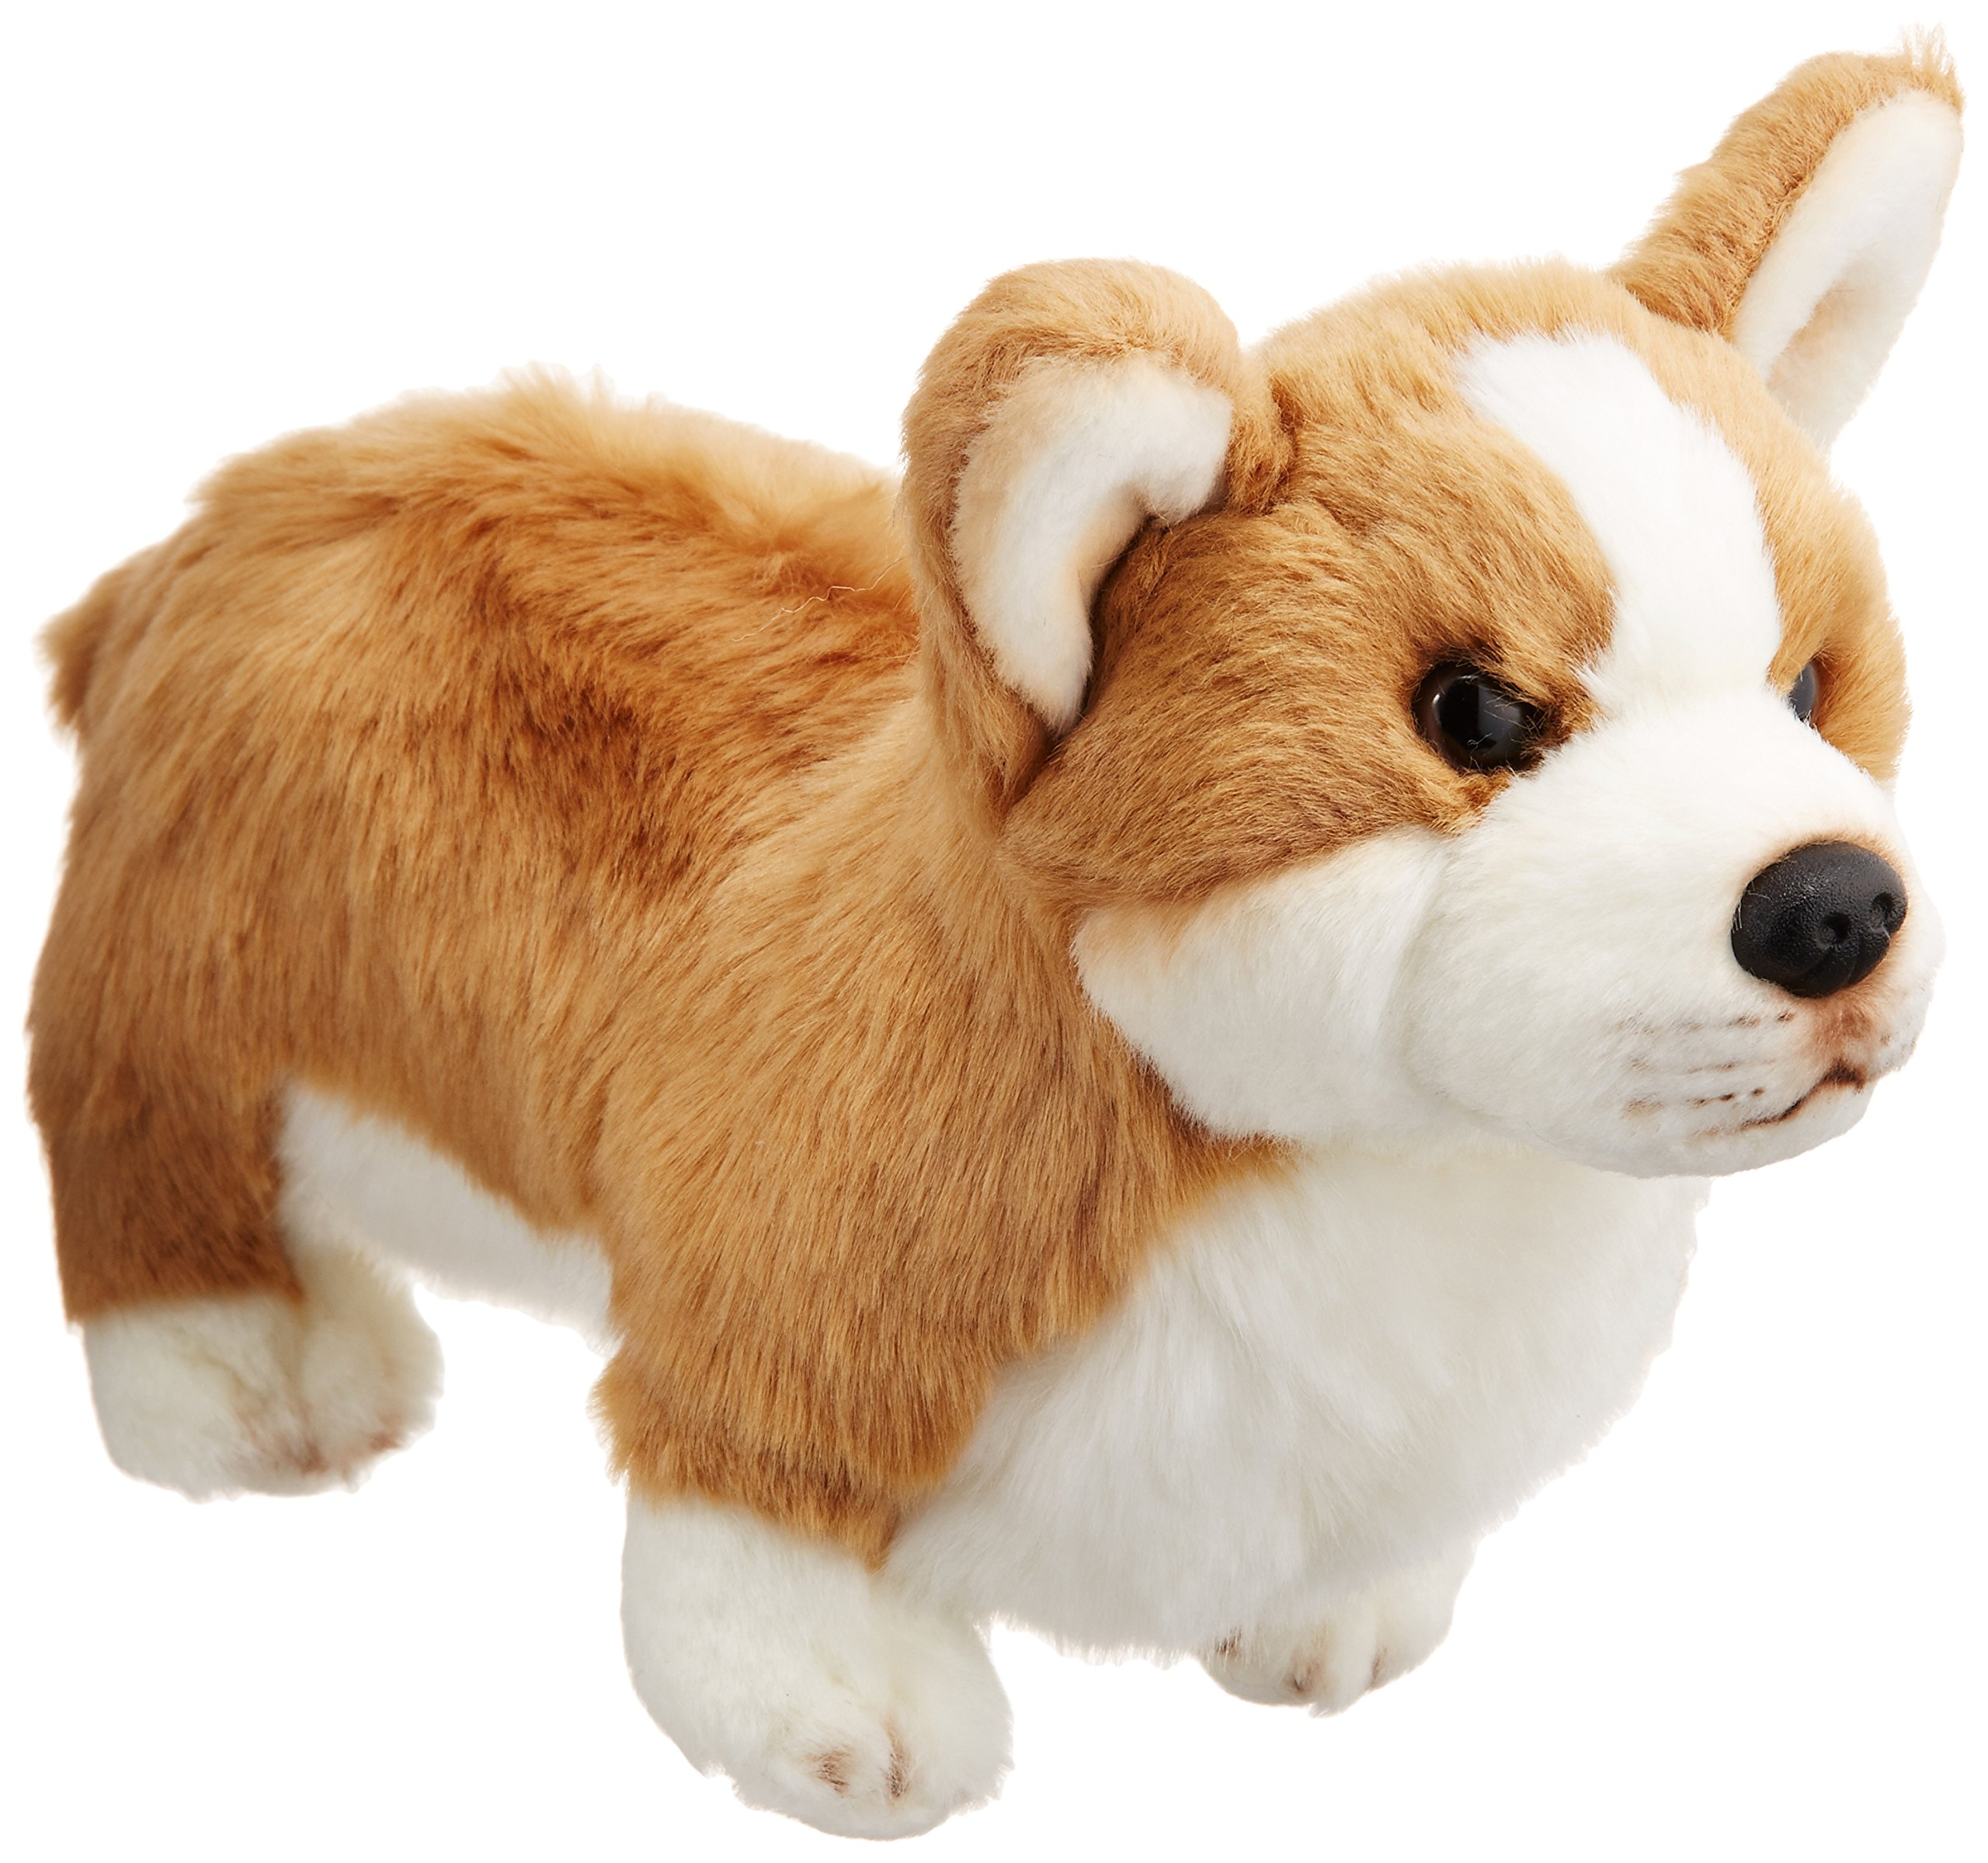 DEMDACO Nat /& Jules Alert Small Husky Dog Childrens Plush Stuffed Animal Toy